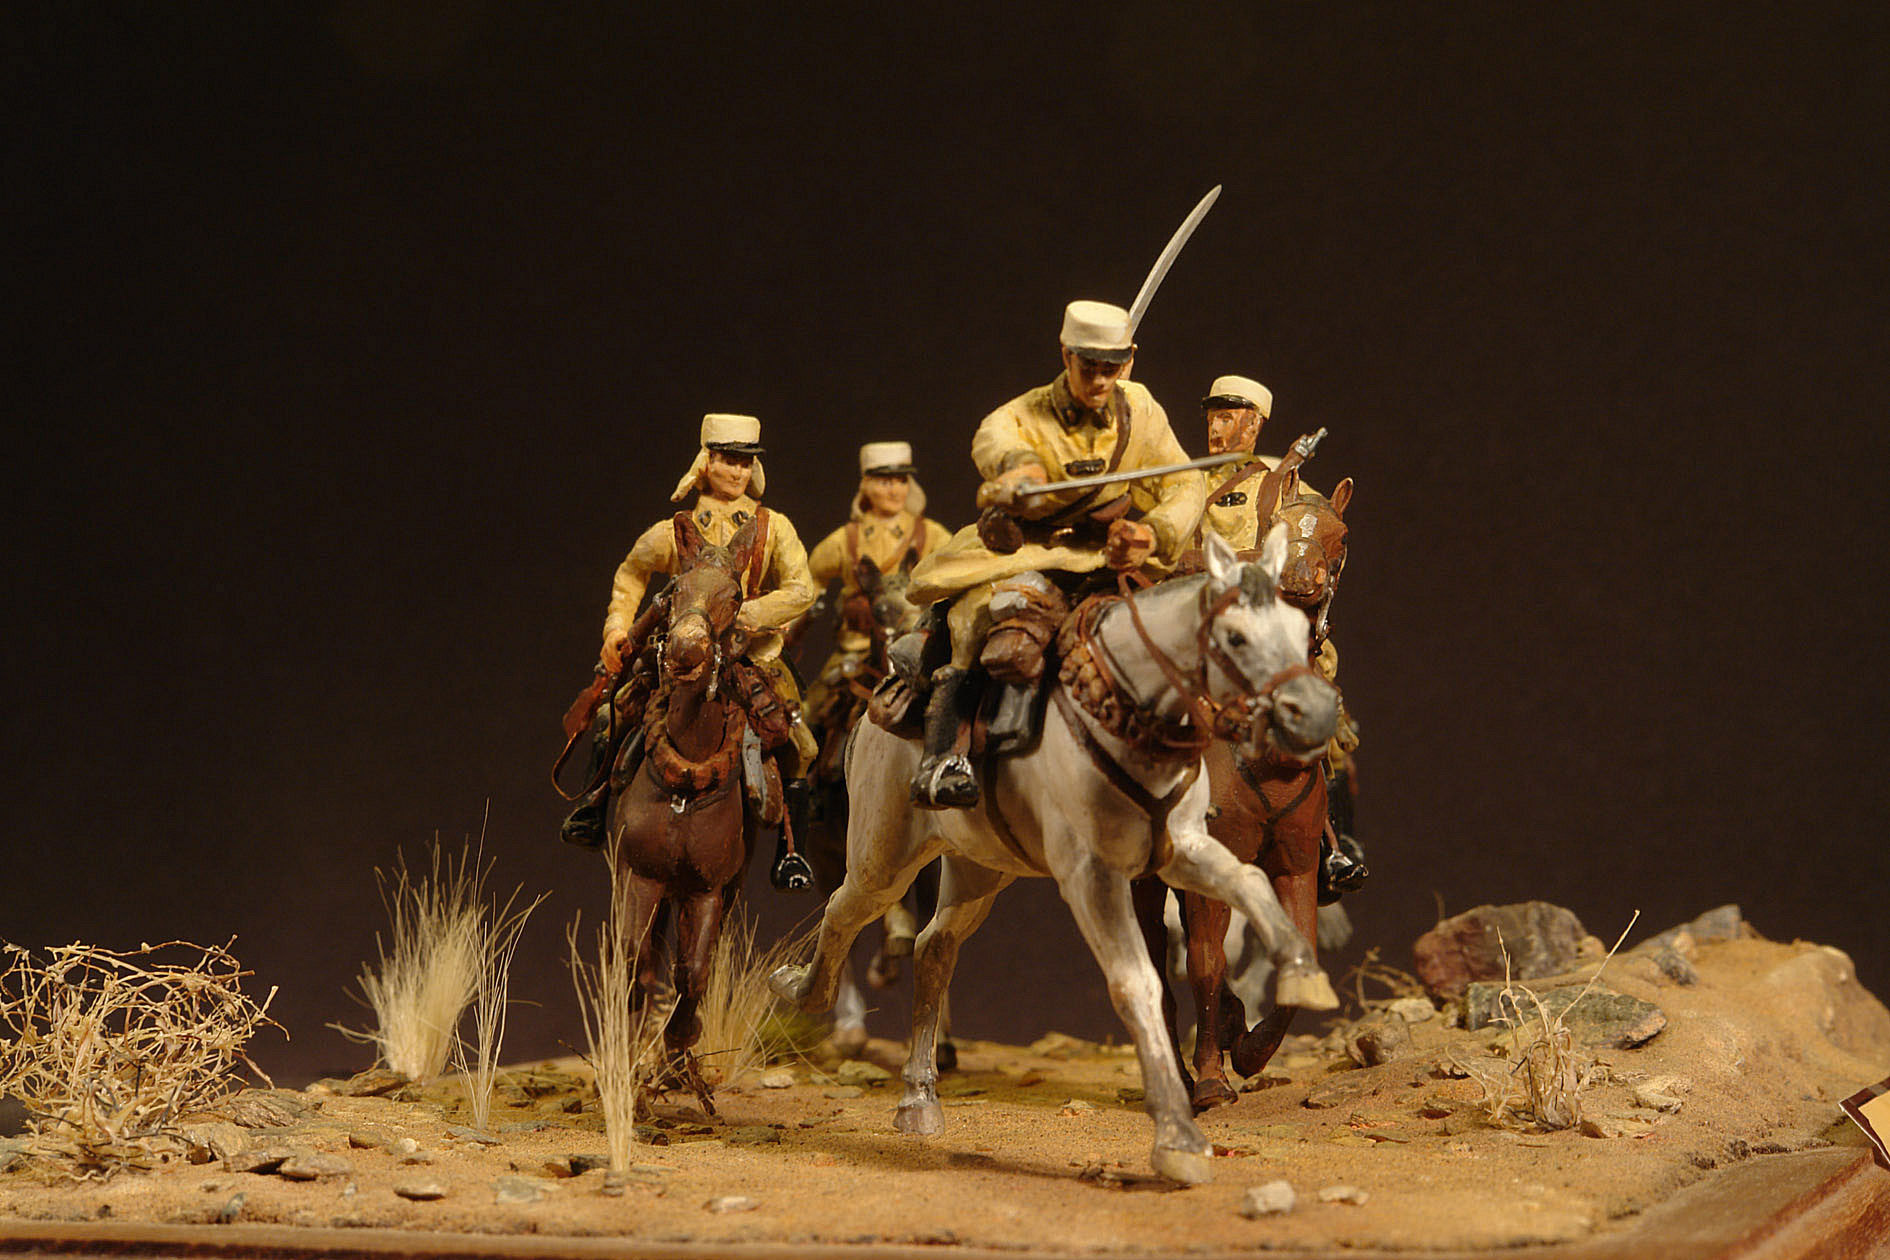 1925-Fransk-kavaleriangreb-i-Marokko-2